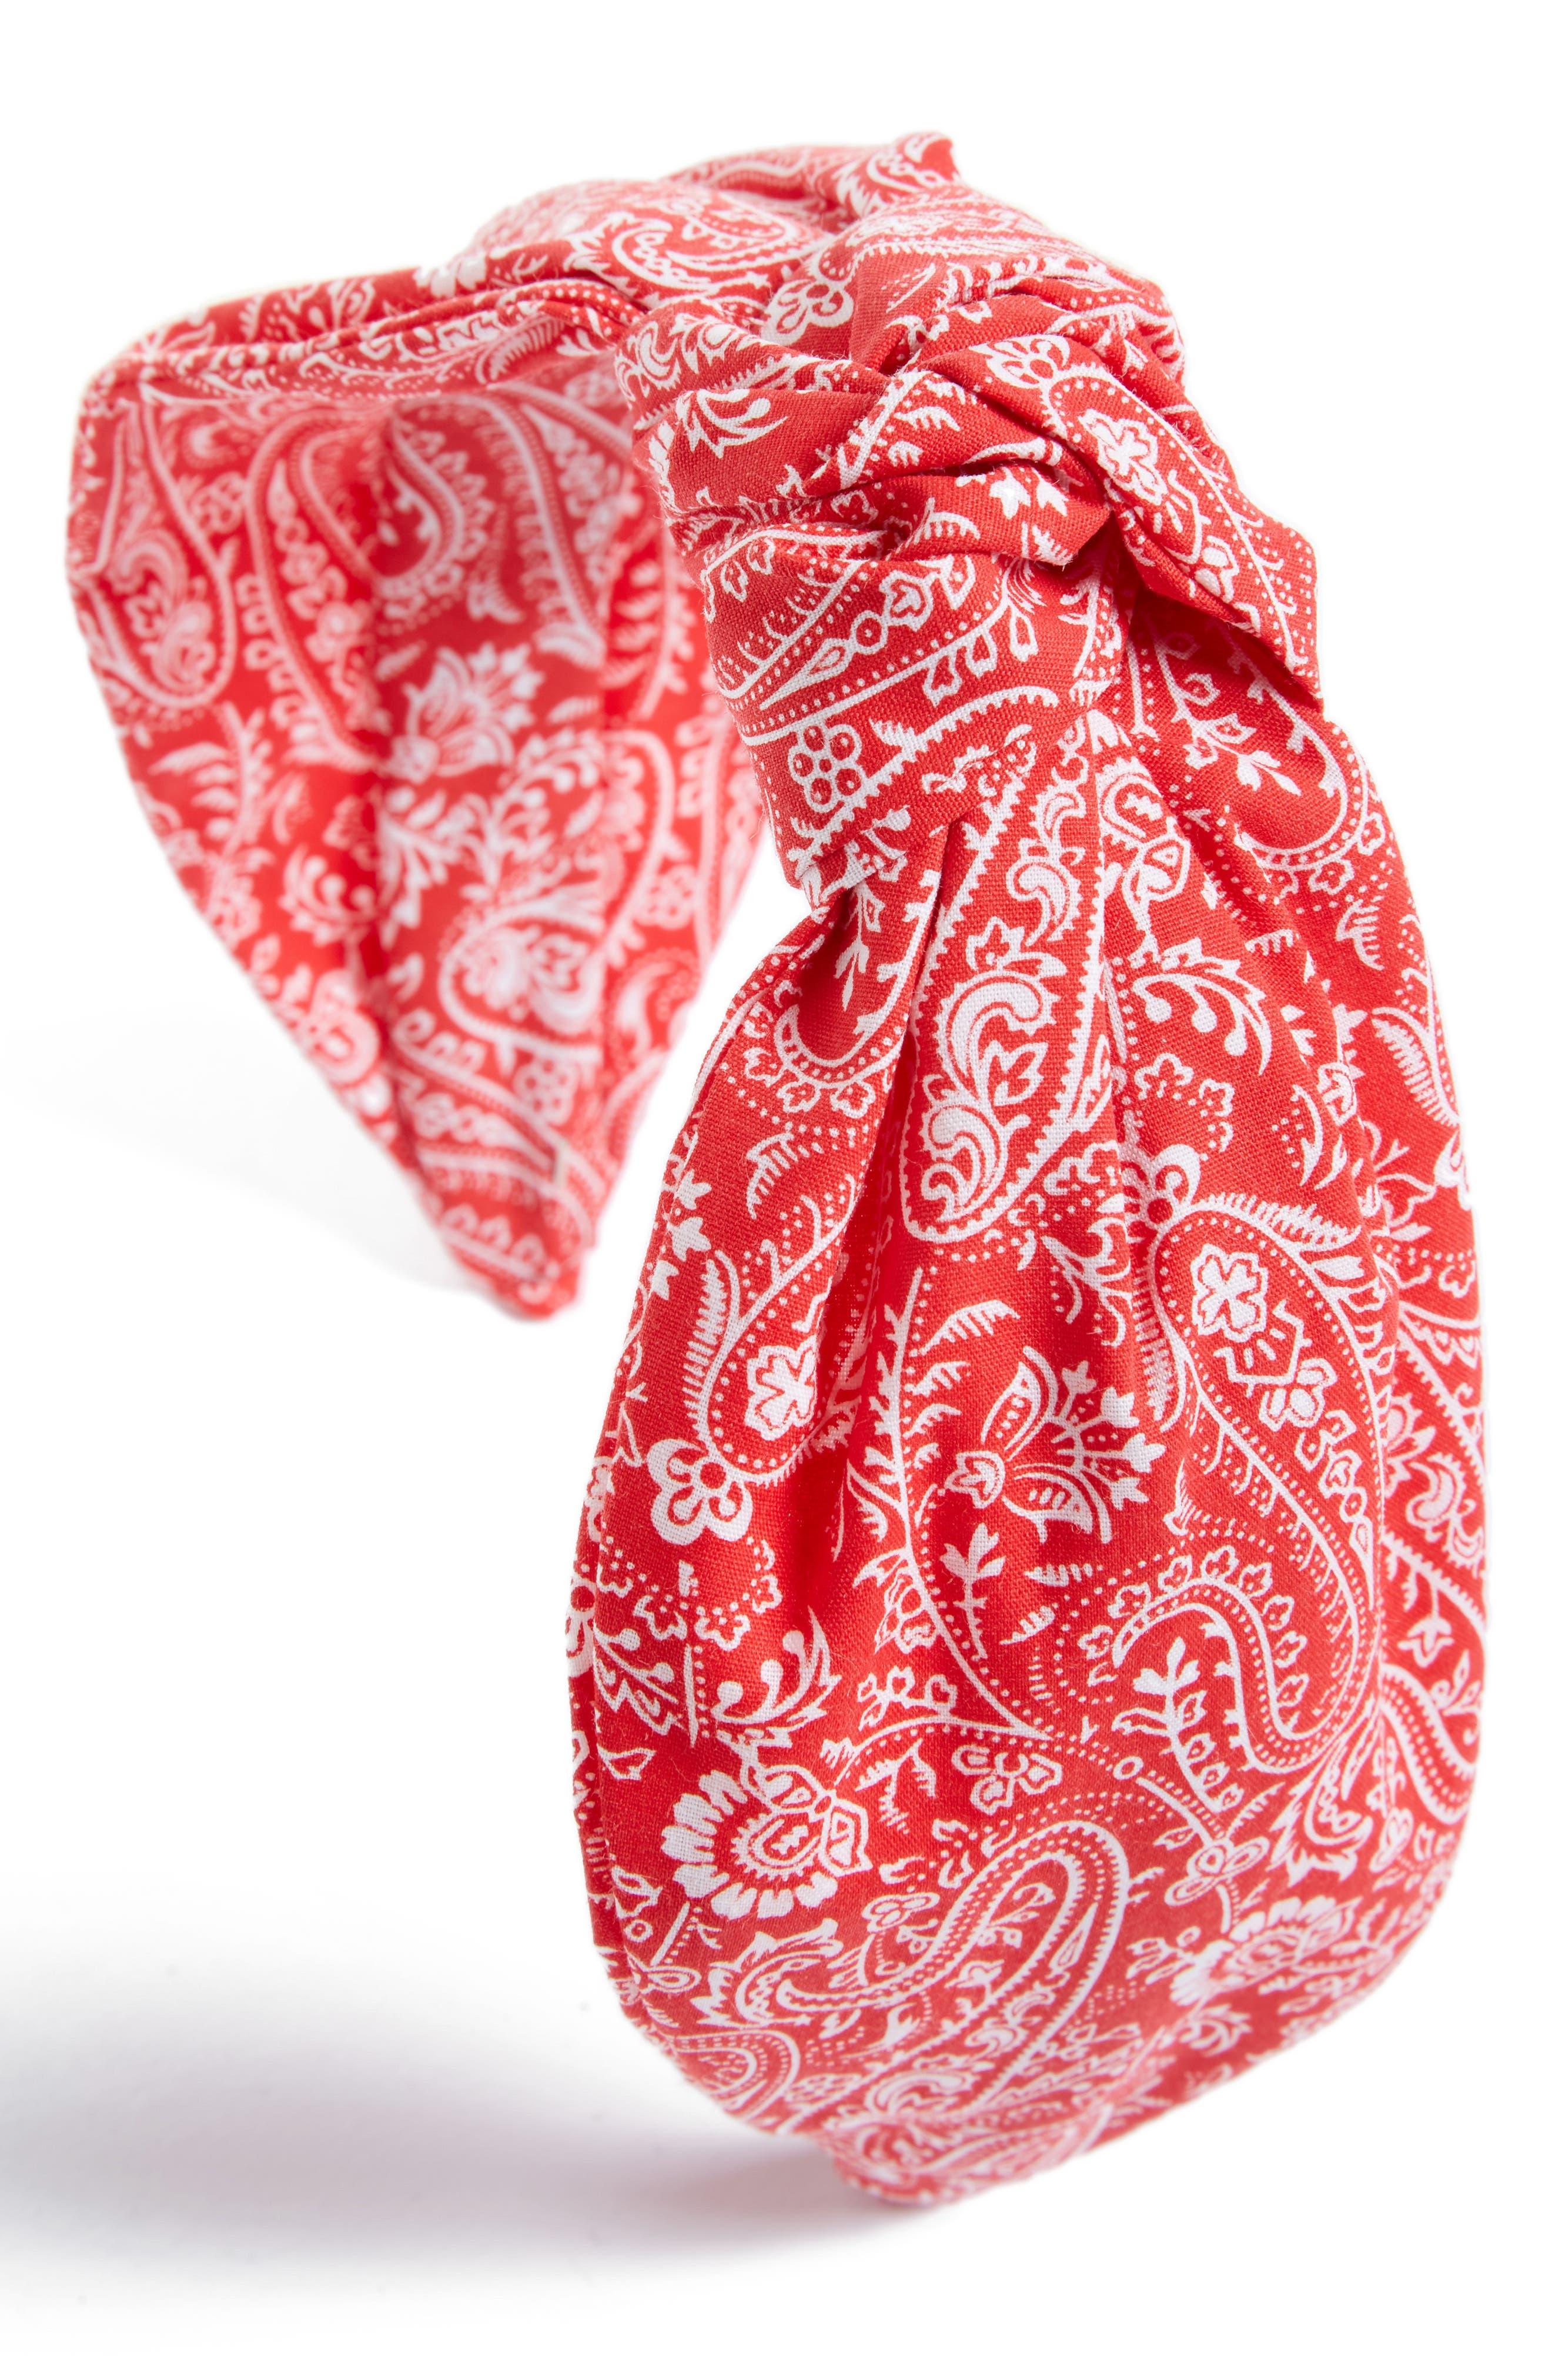 Alternate Image 1 Selected - Tasha Paisley Turban Knot Headband